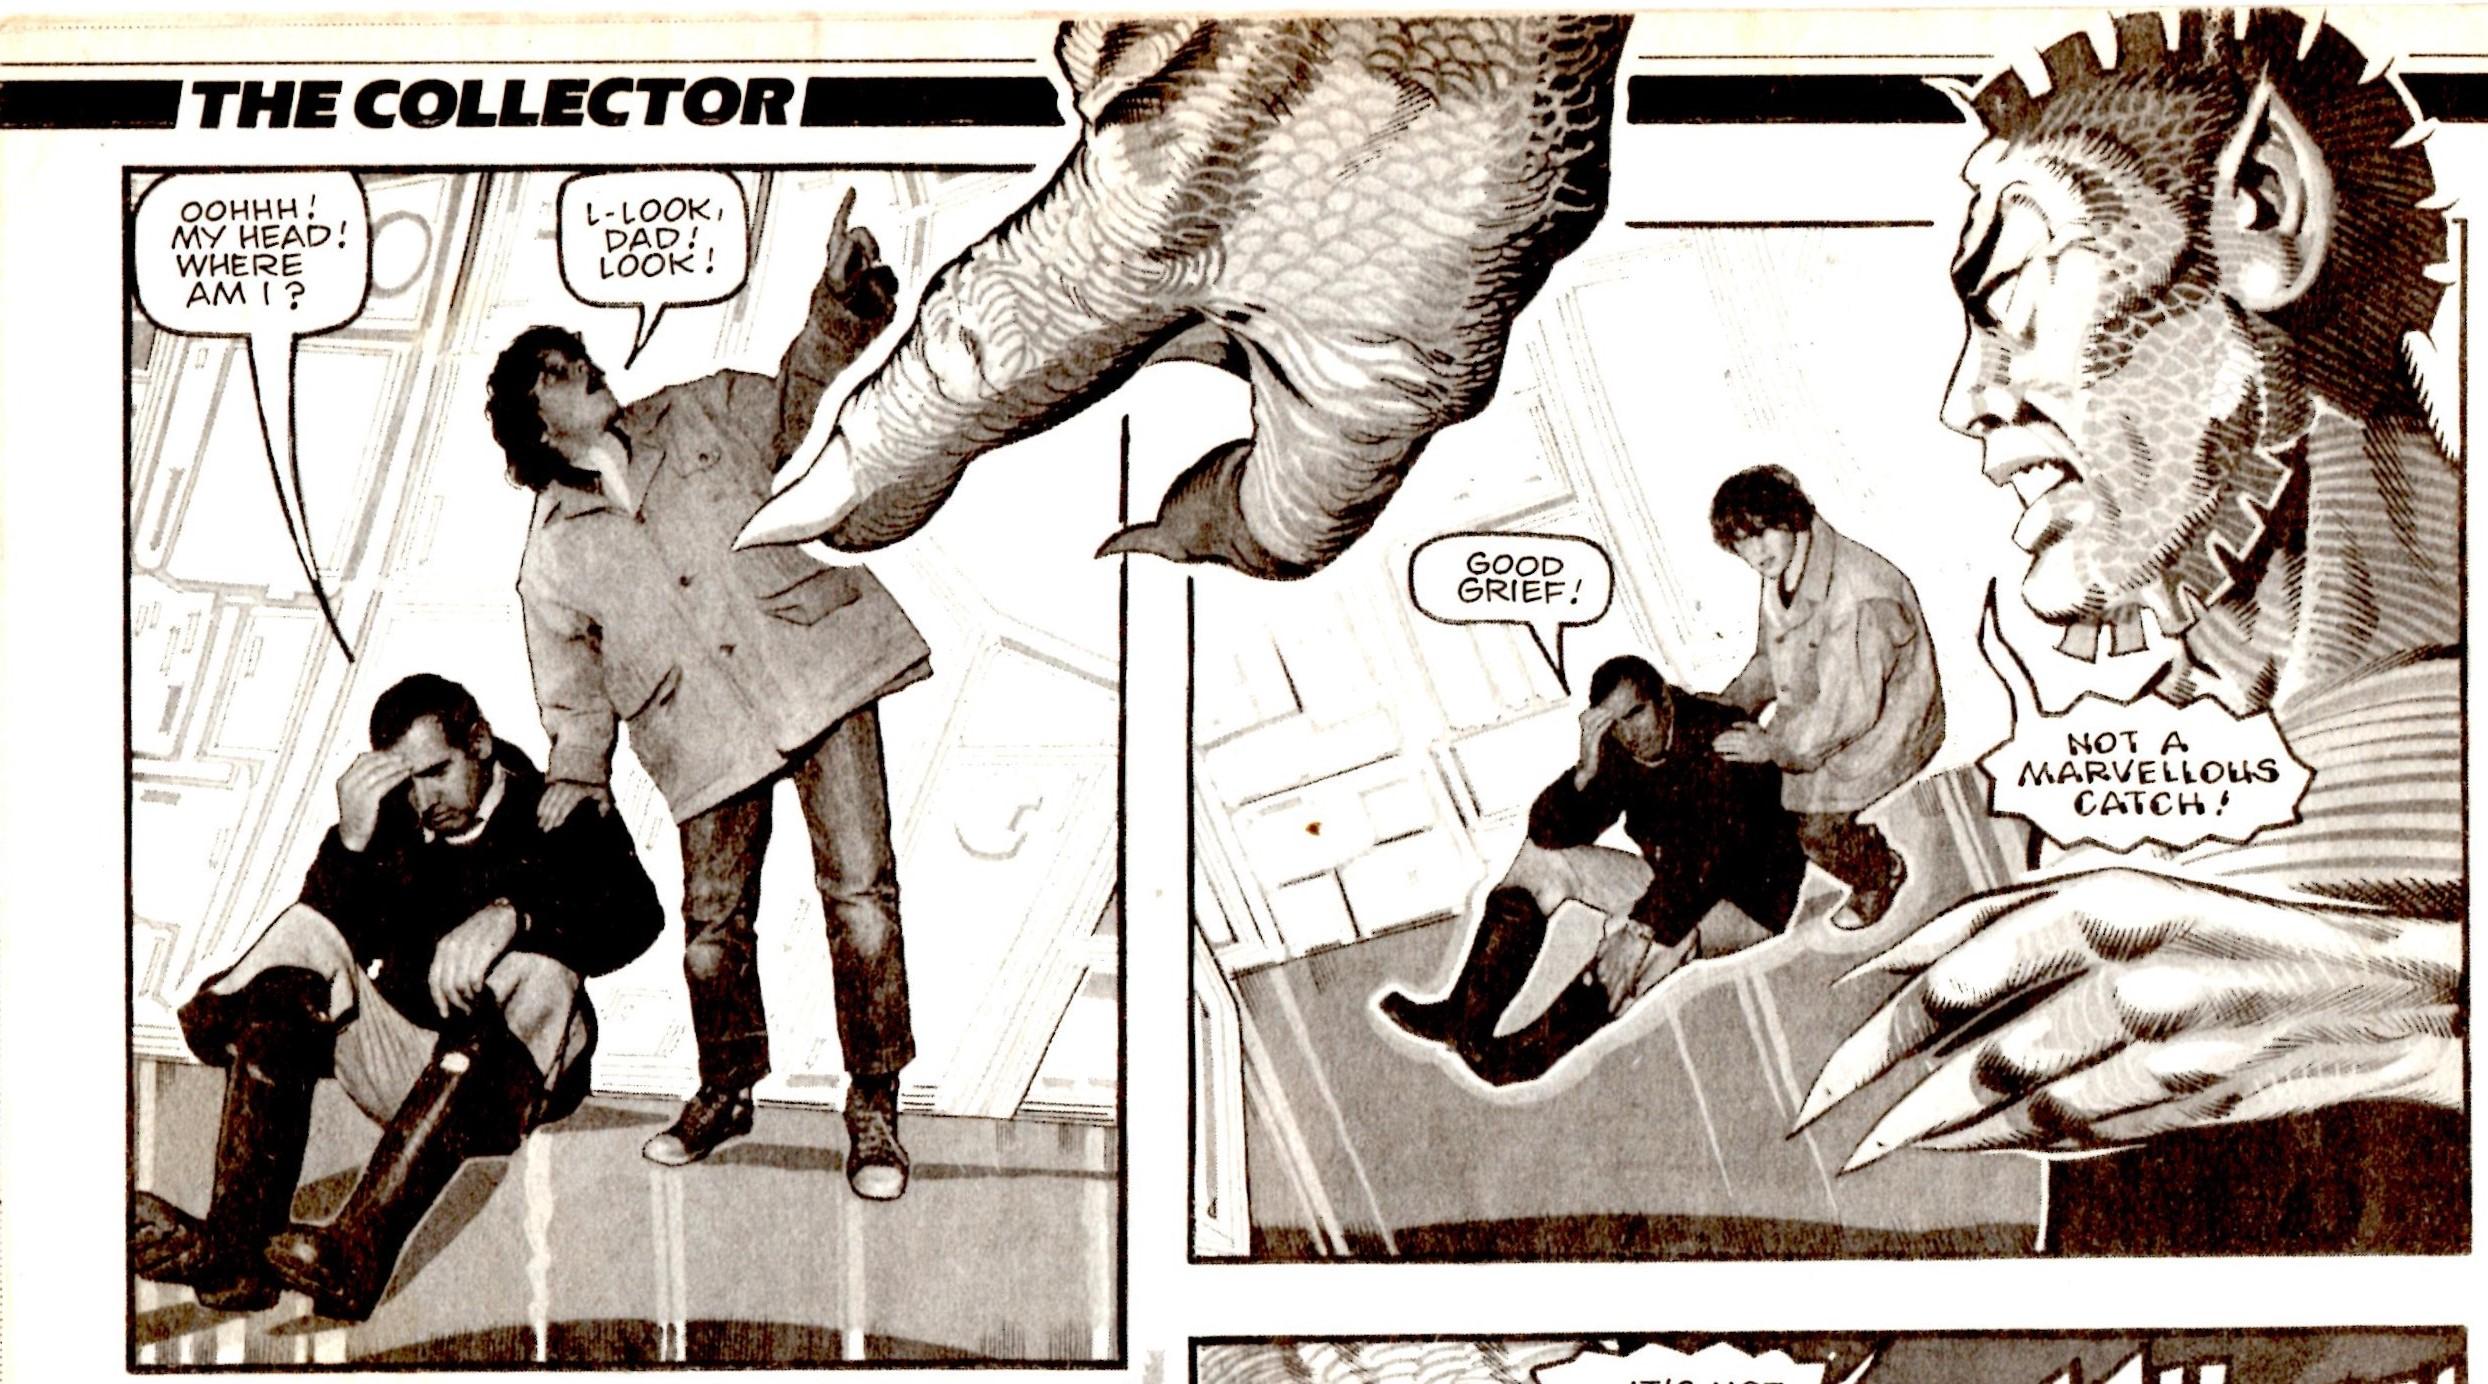 The Collector: The Eye of the Fish: Roy Preston (writer), Gary Compton (photographer), Ron Smith (artist)